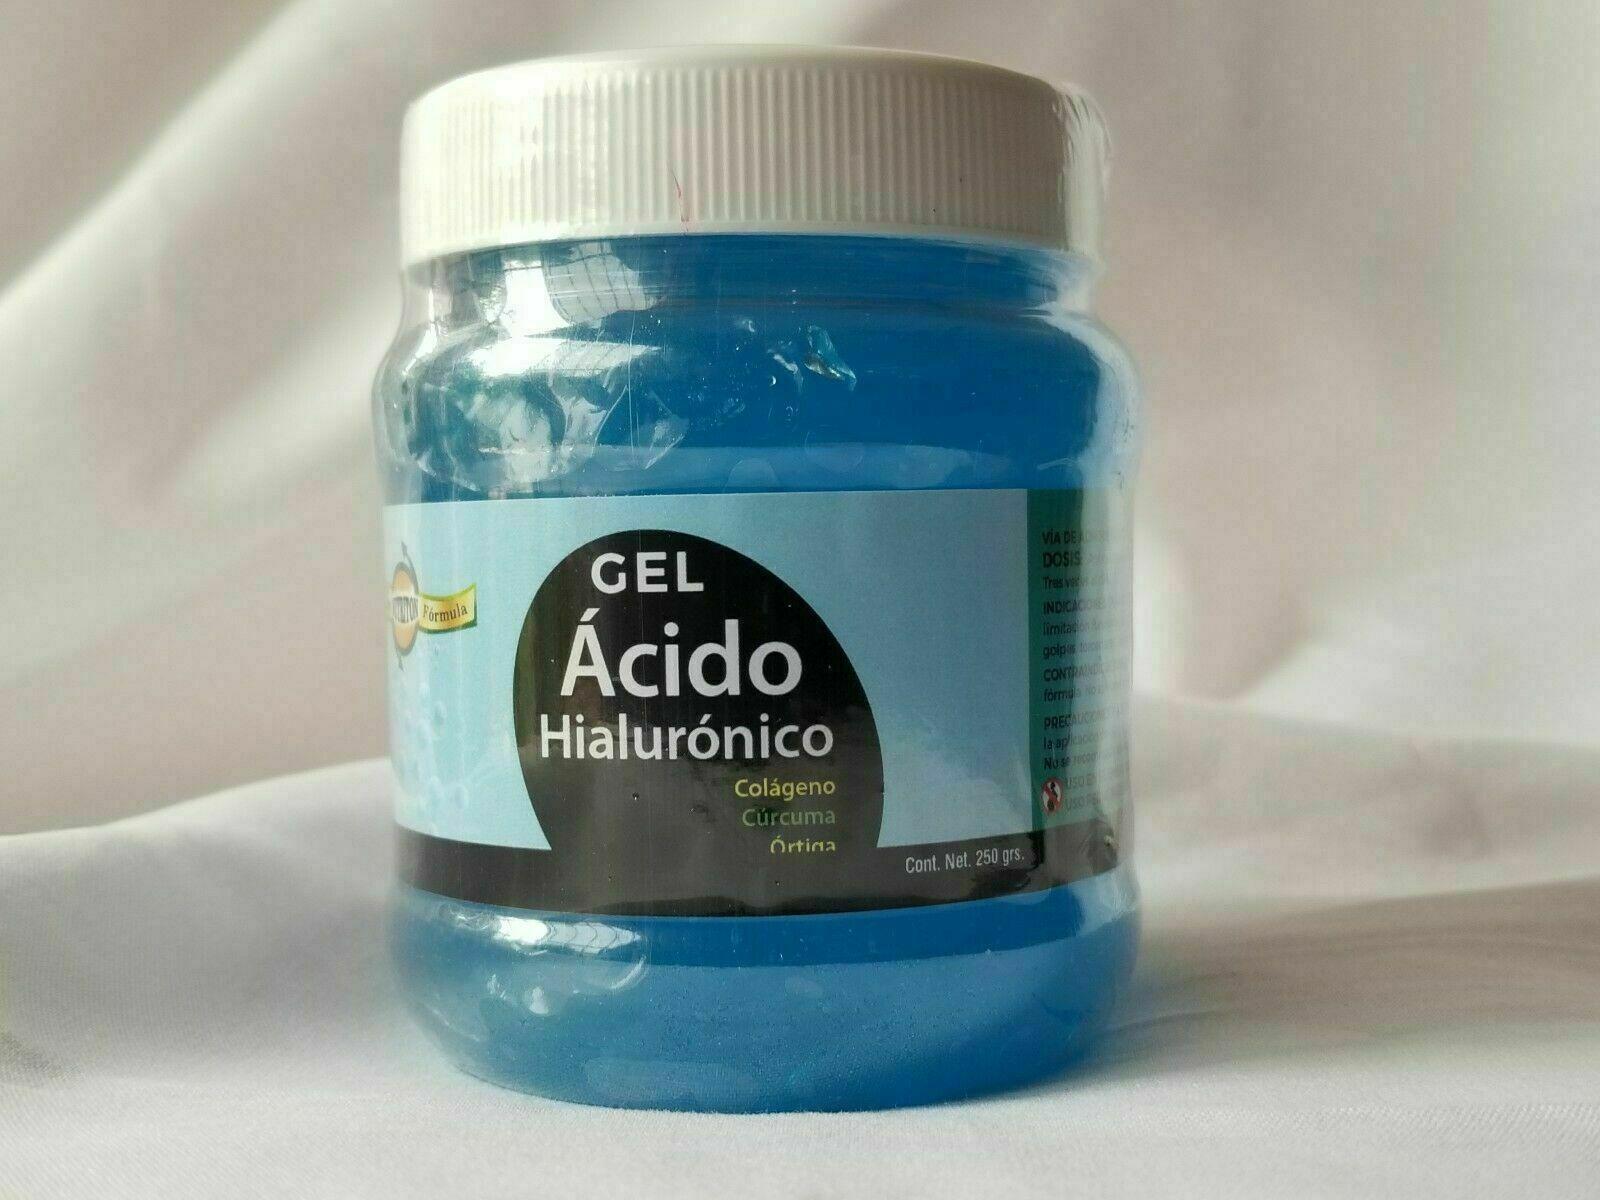 nutrition acido hialuronico colageno curcuma ortiga